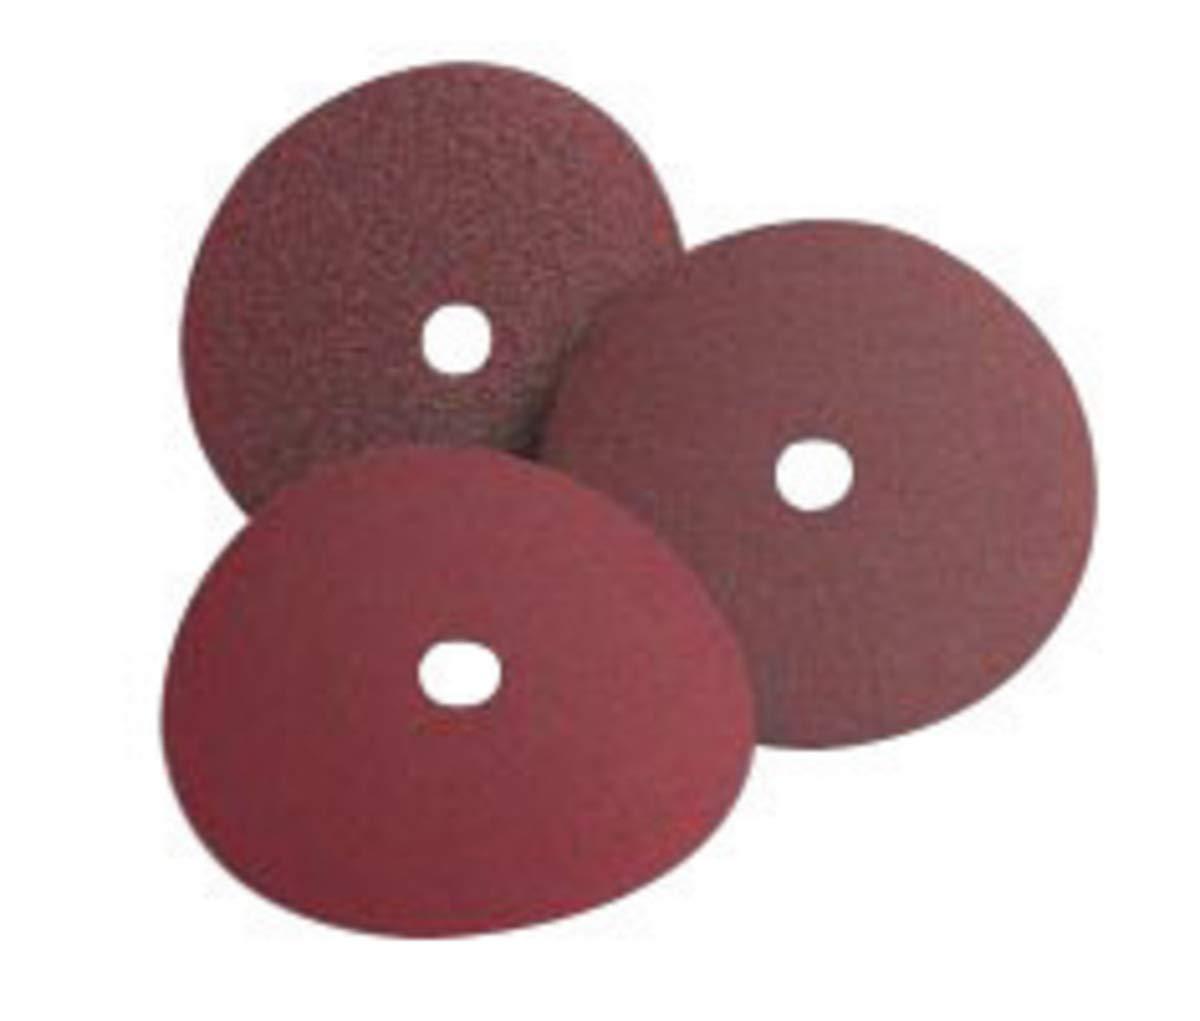 Standard Abrasives 4 1/2'' 24 Grit Aluminum Oxide EZ Quick Change Resin Bond Fiber Disc, Package Size: 25 Each